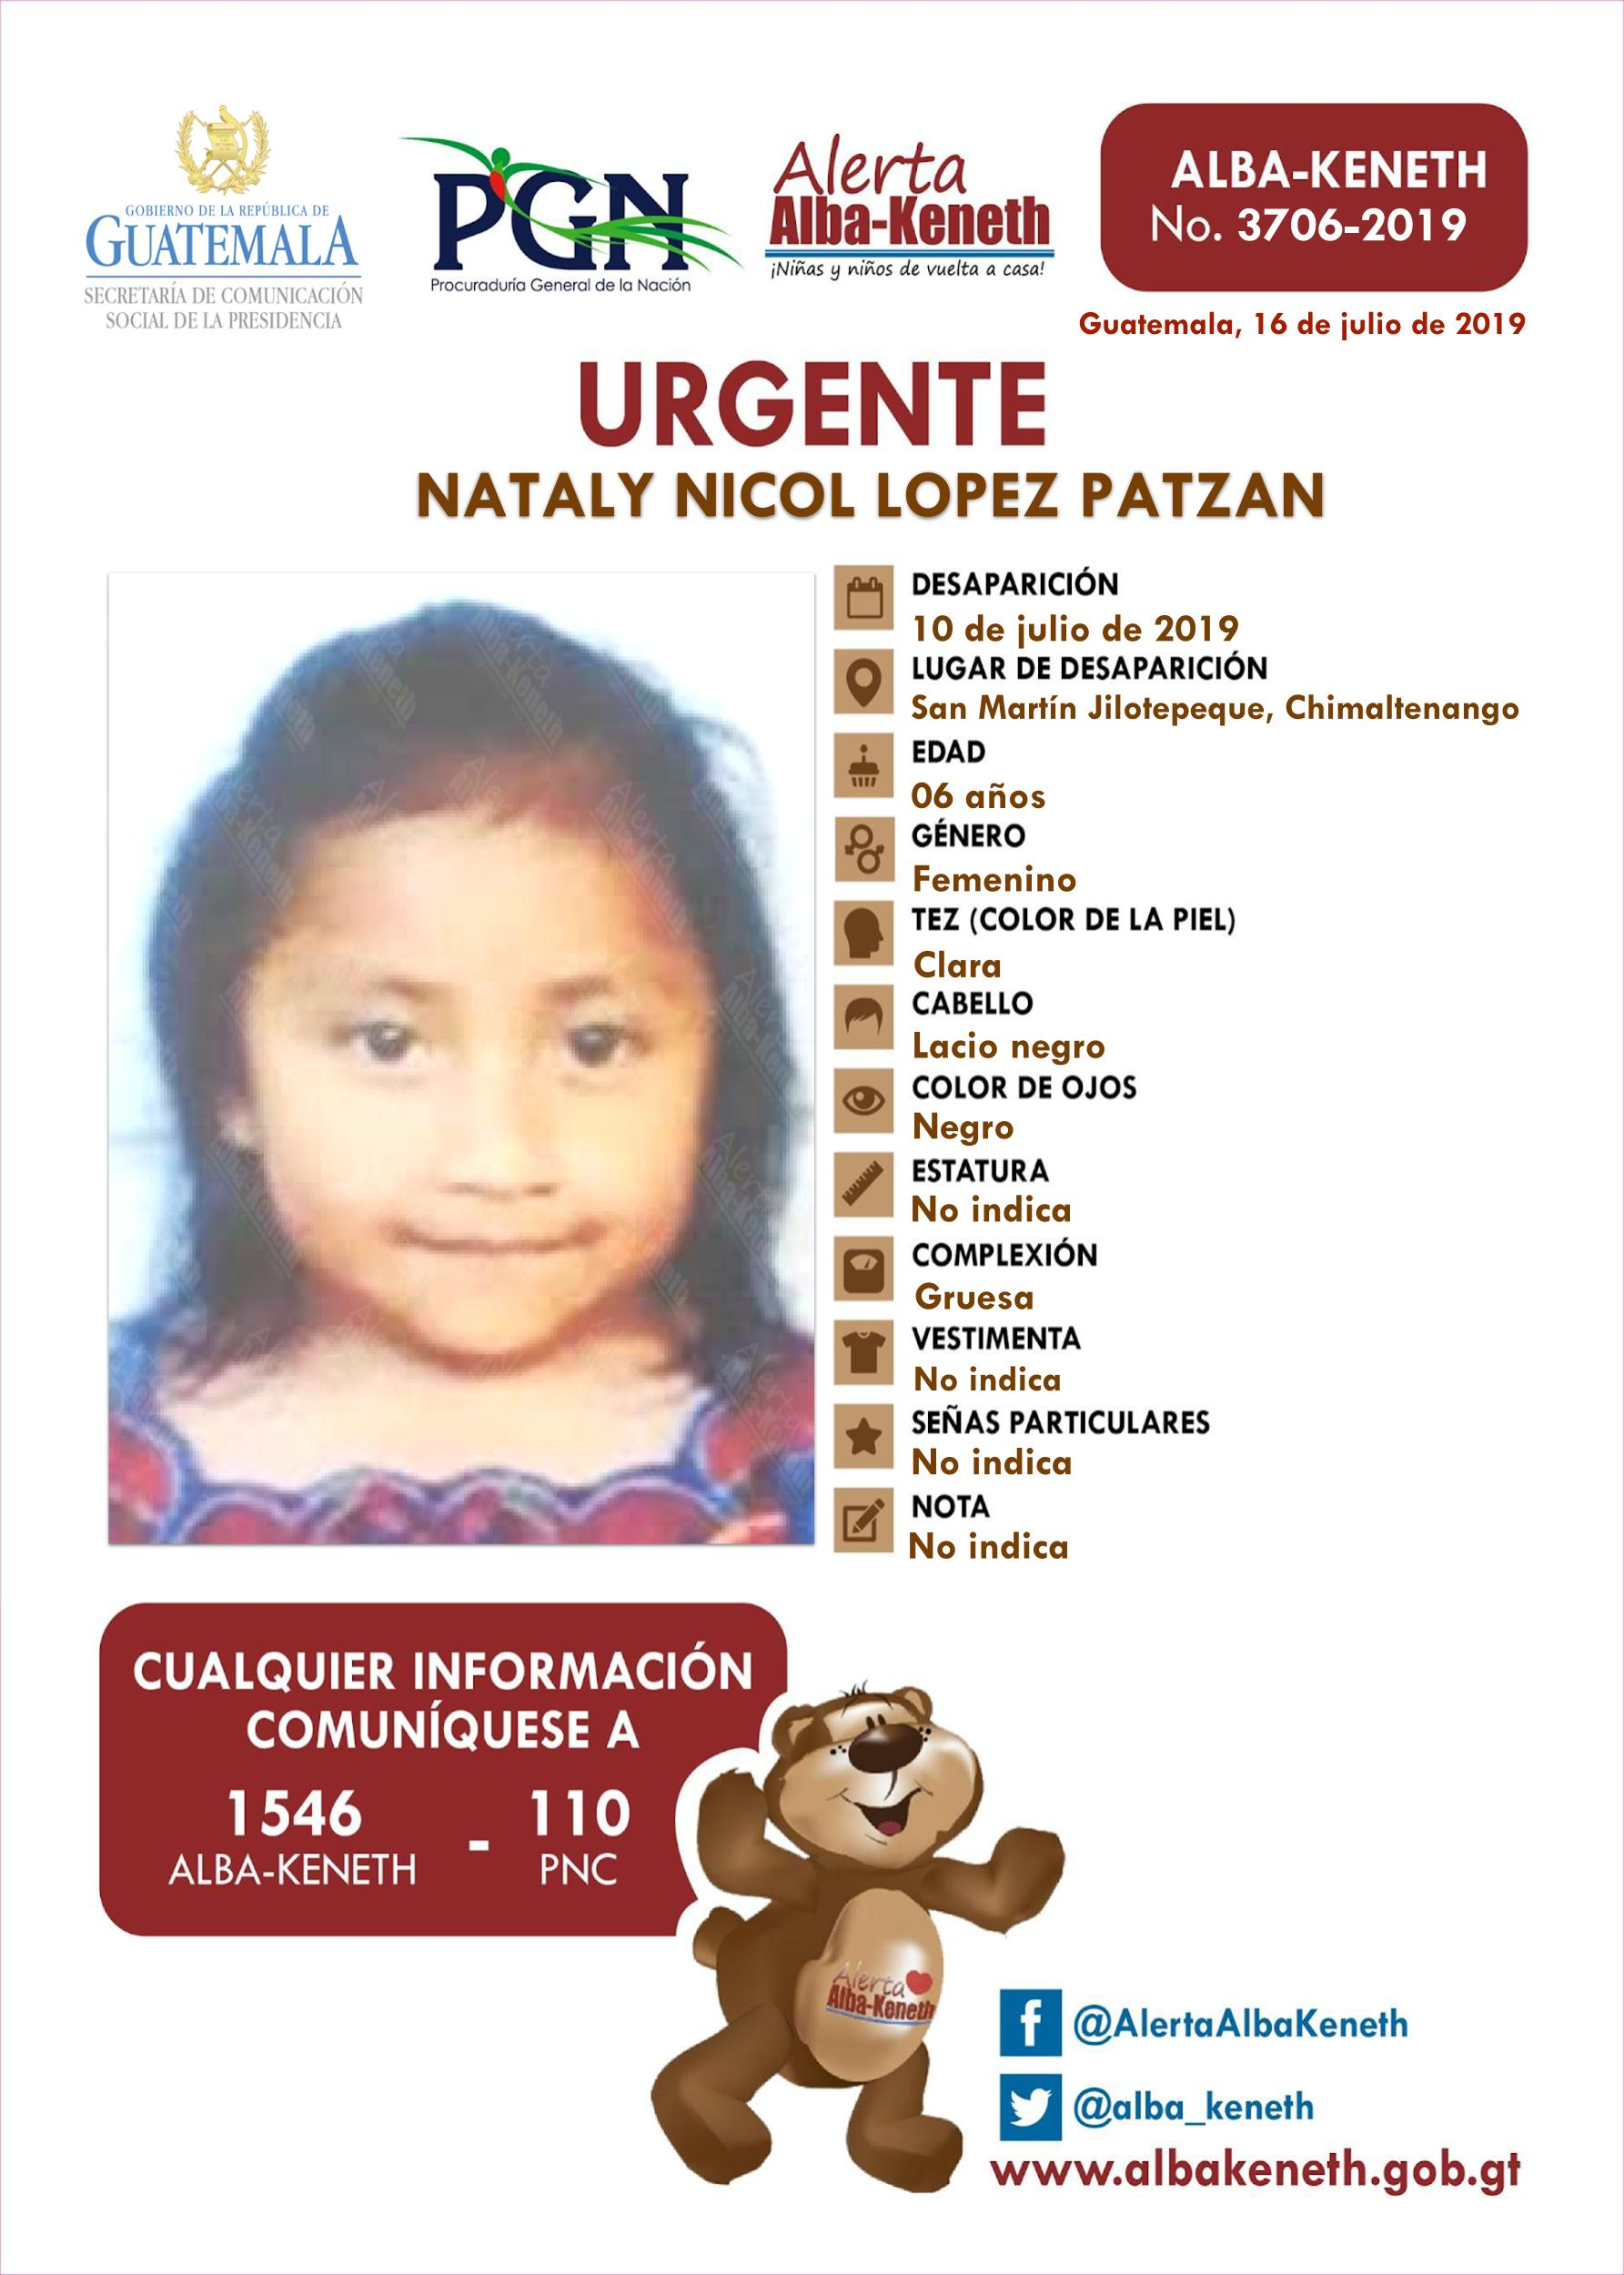 Nataly Nicol Lopez Patzan